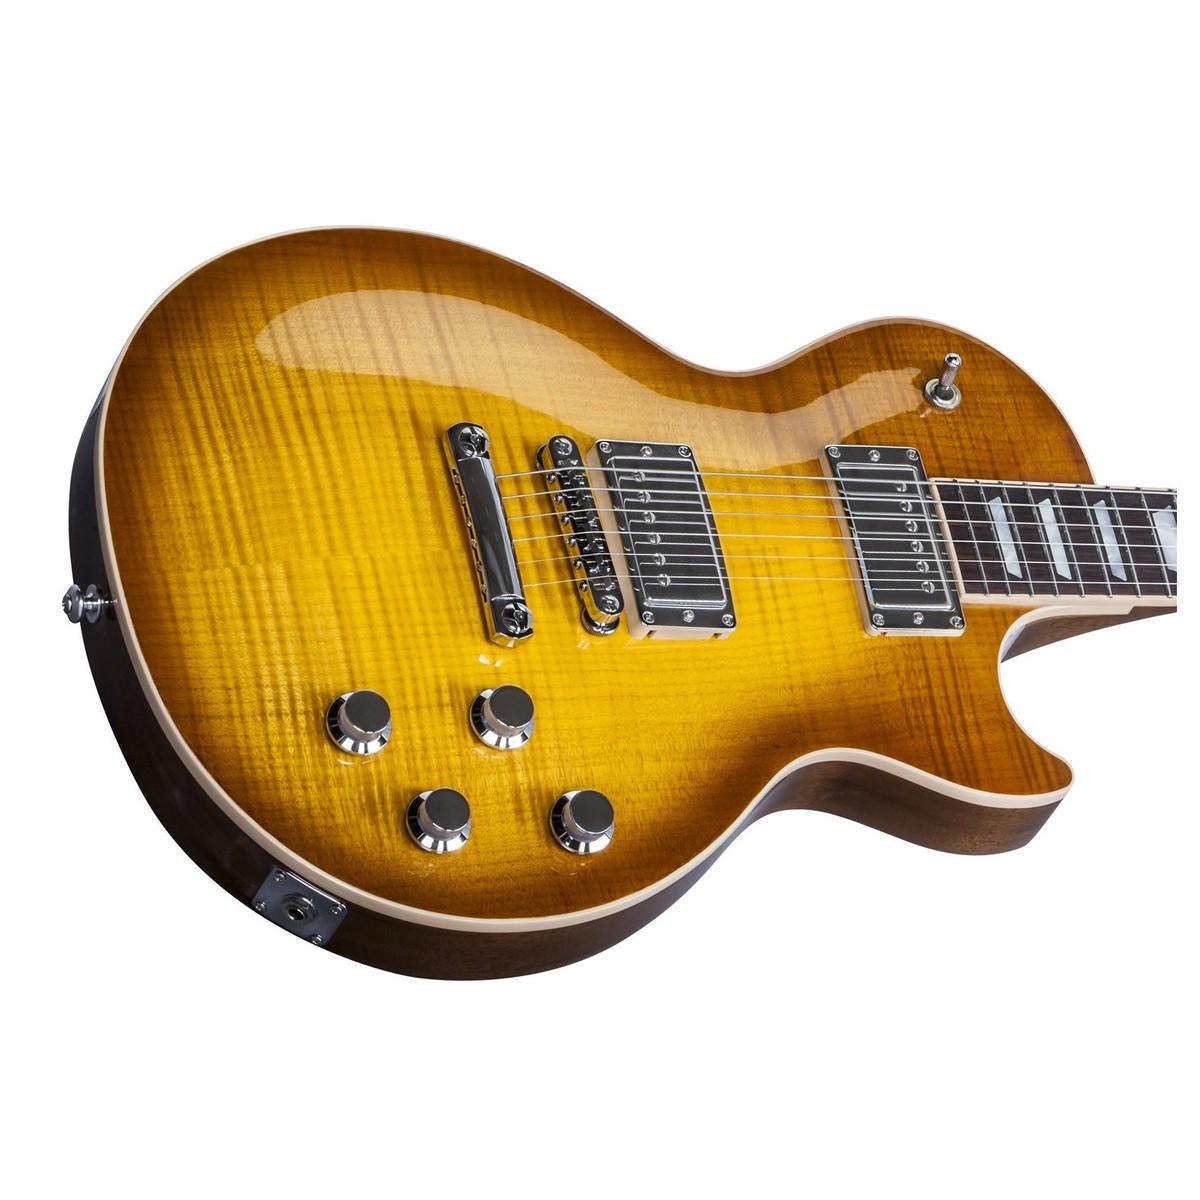 gibson les paul standard hp electric guitar honey burst 2017 at. Black Bedroom Furniture Sets. Home Design Ideas